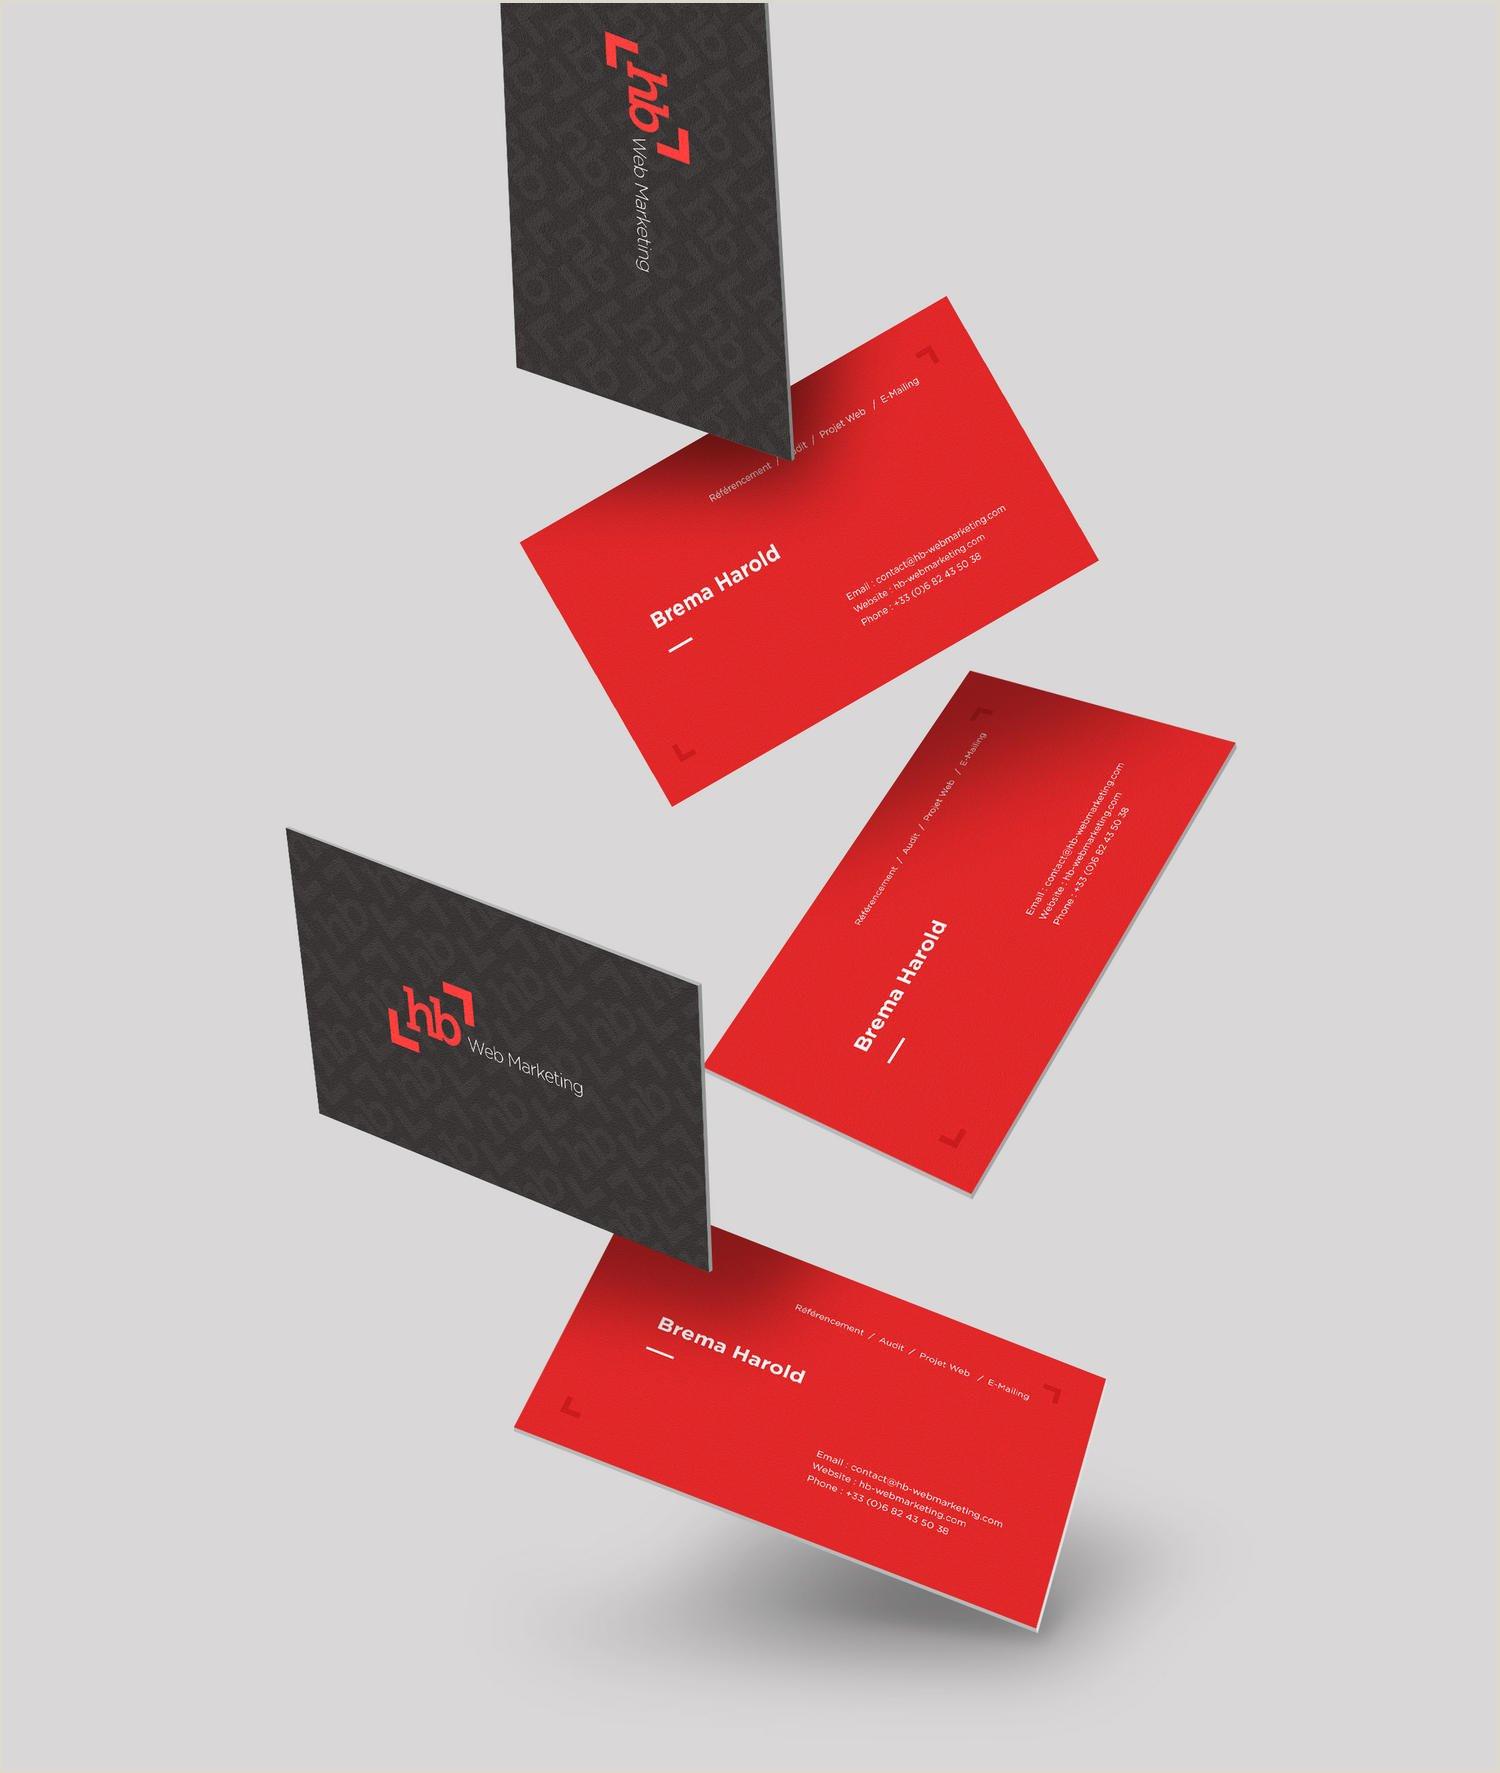 Business Cards Idea Business Card Design By Alanaragondesign On Envato Studio